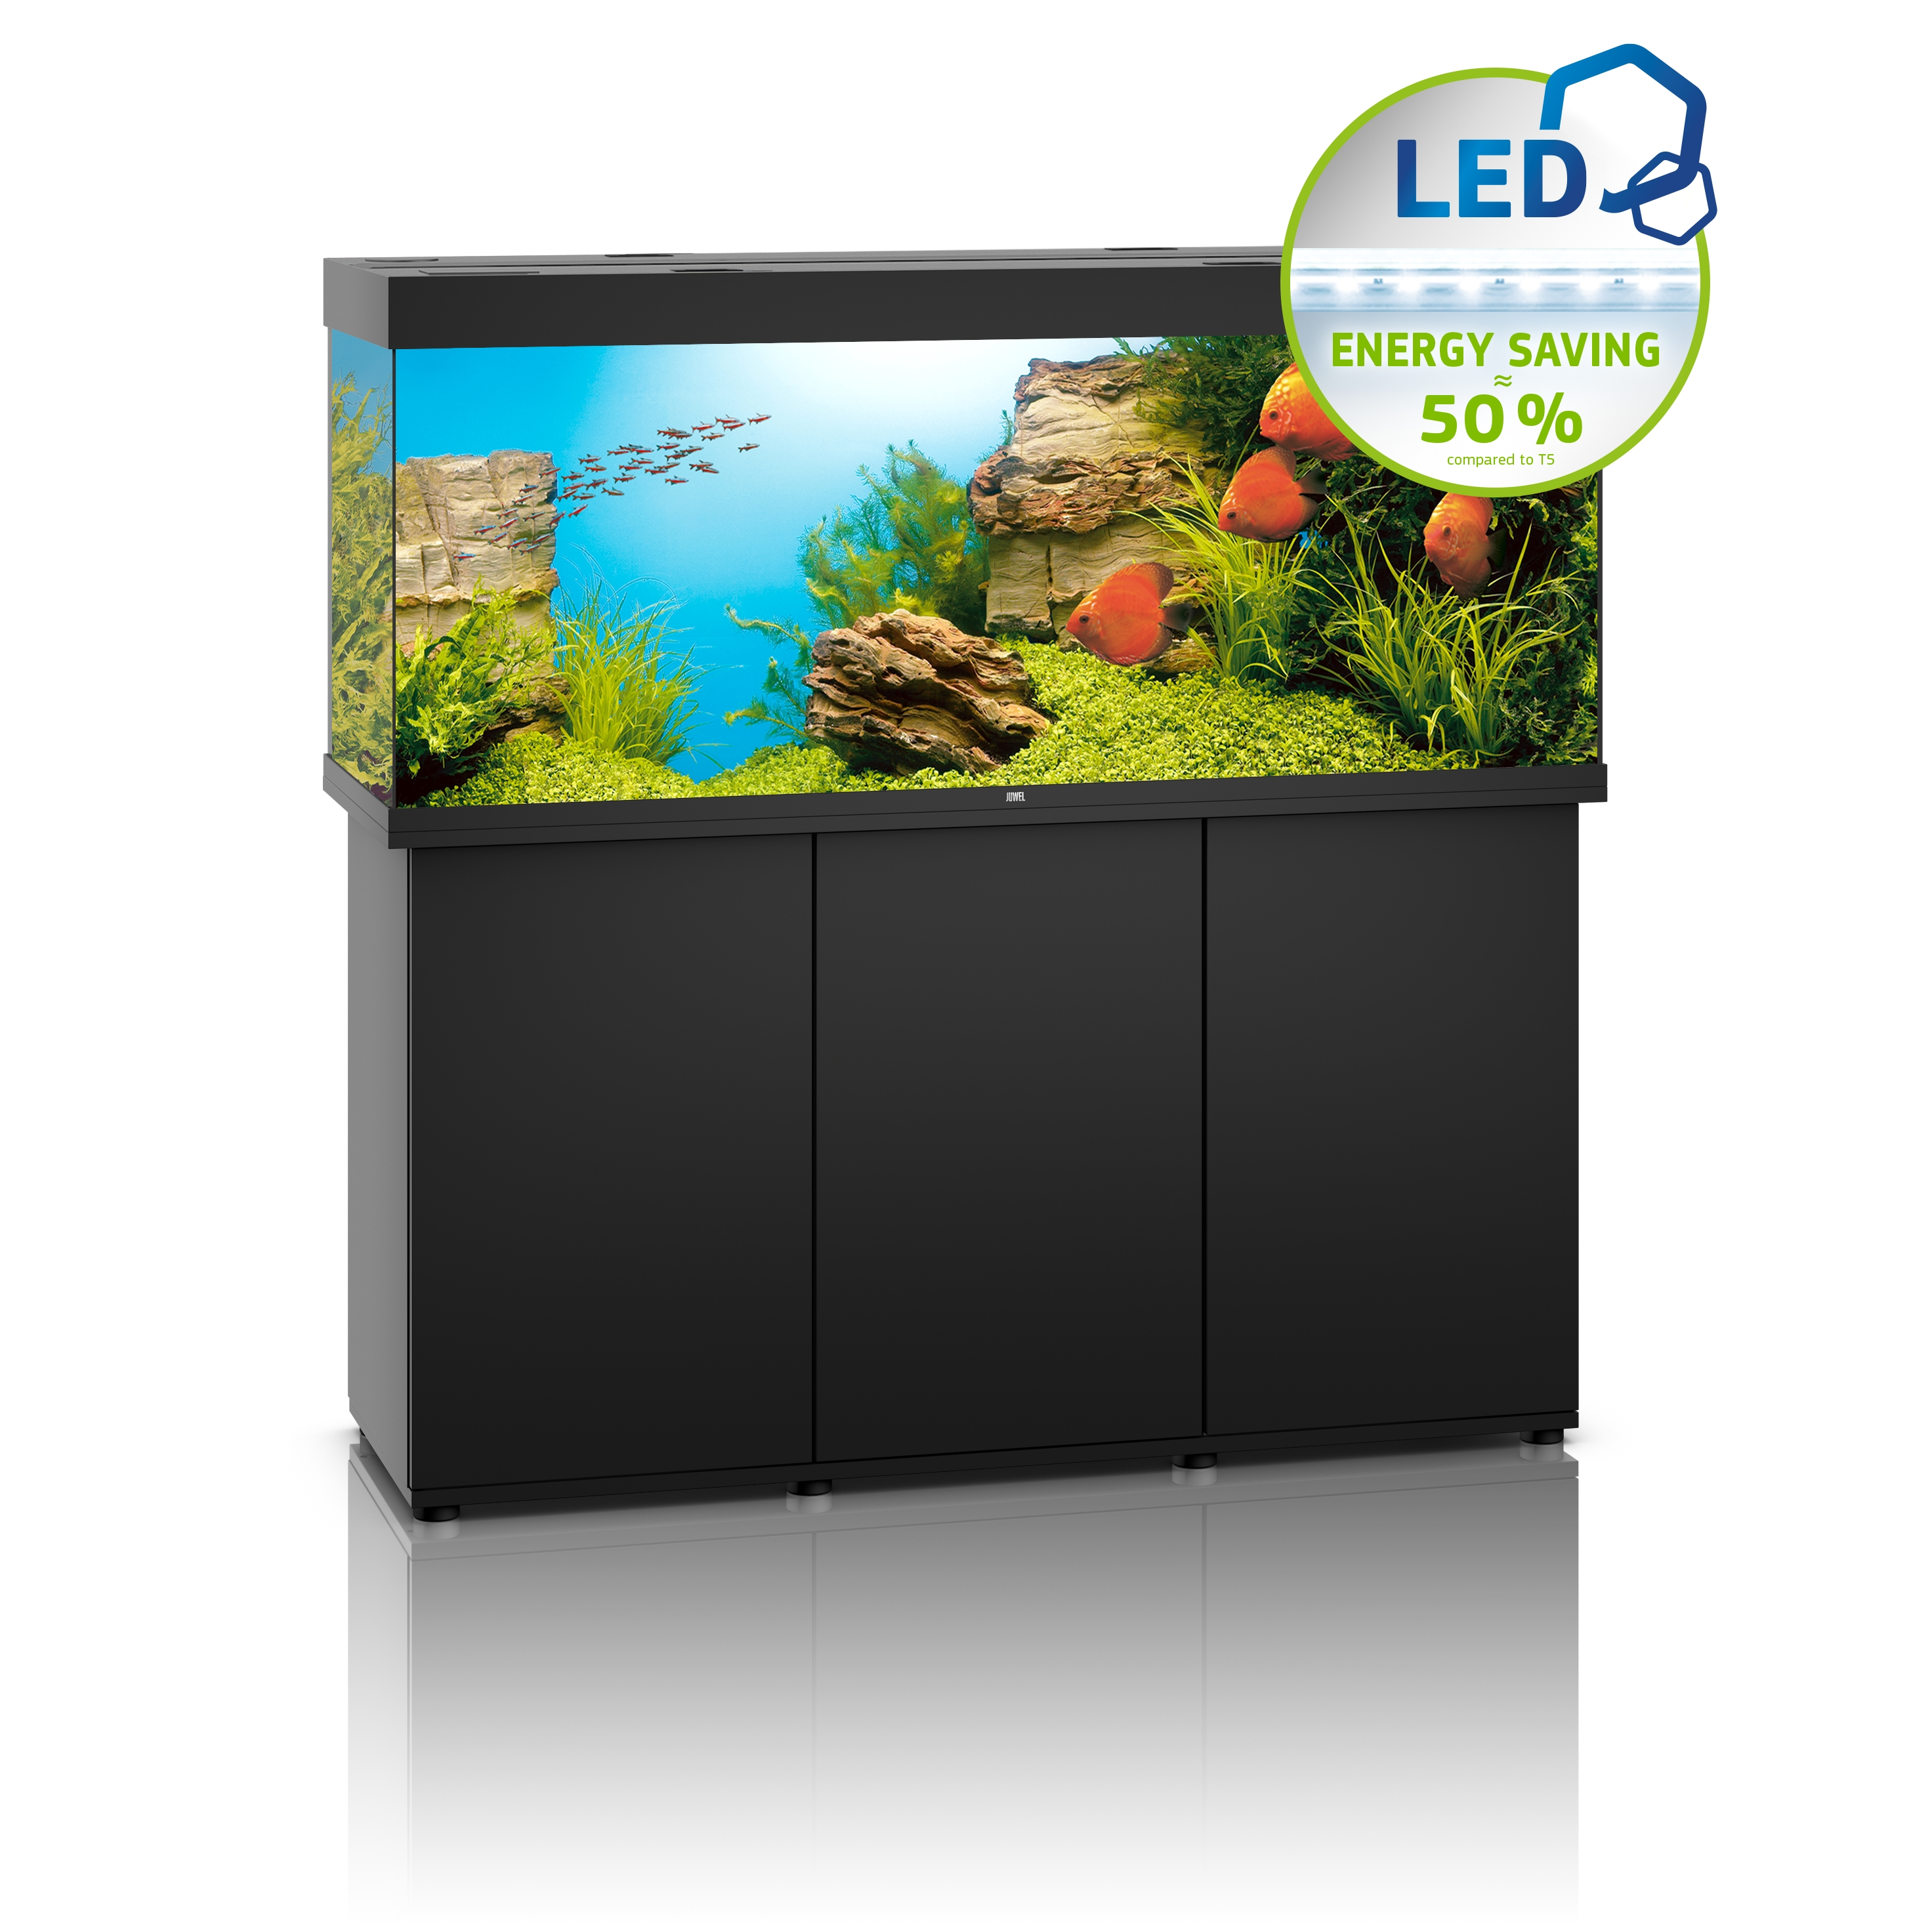 Juwel Aquarium Rio 450 LED Image